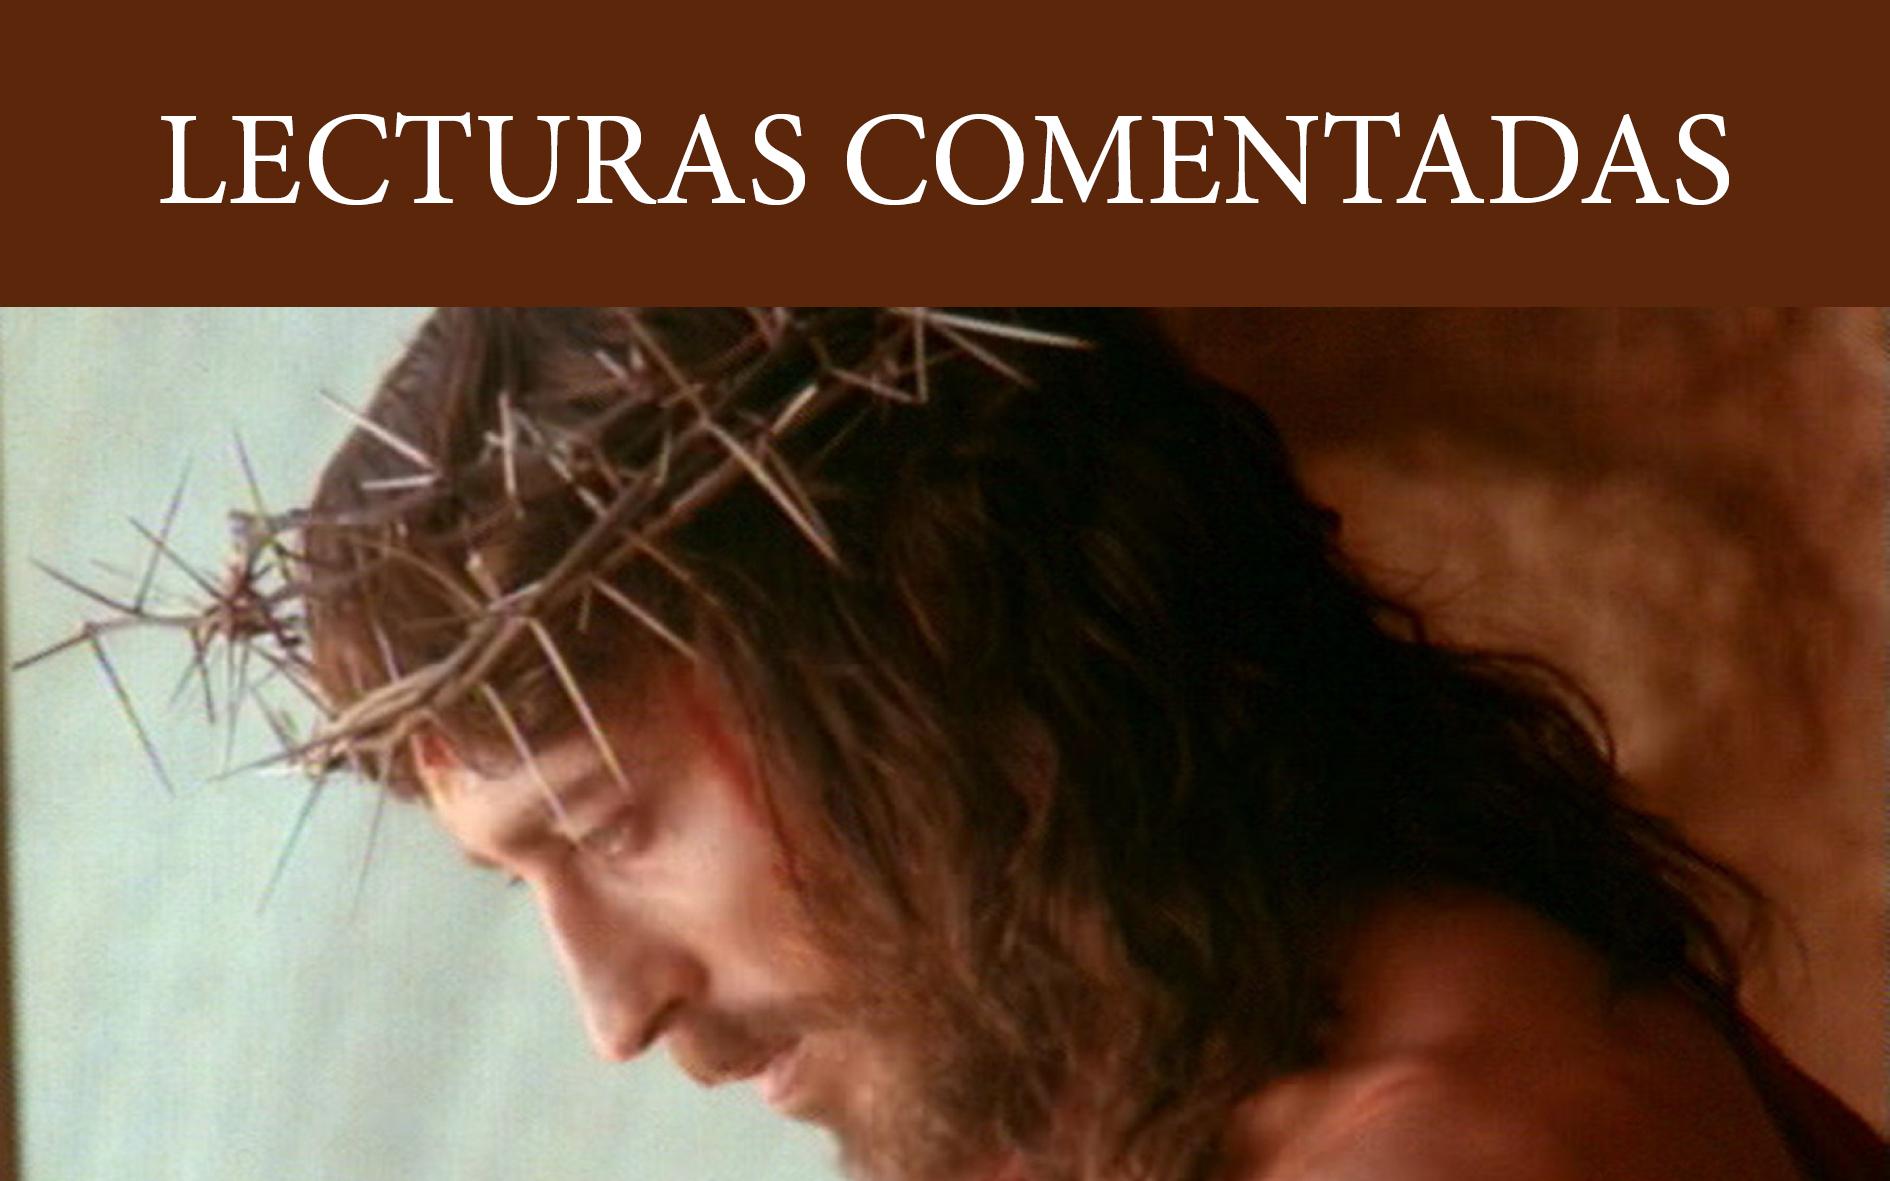 8. REDESCUBRIR A JESÚS DE NAZARET, UN MAESTRO DE VIDA